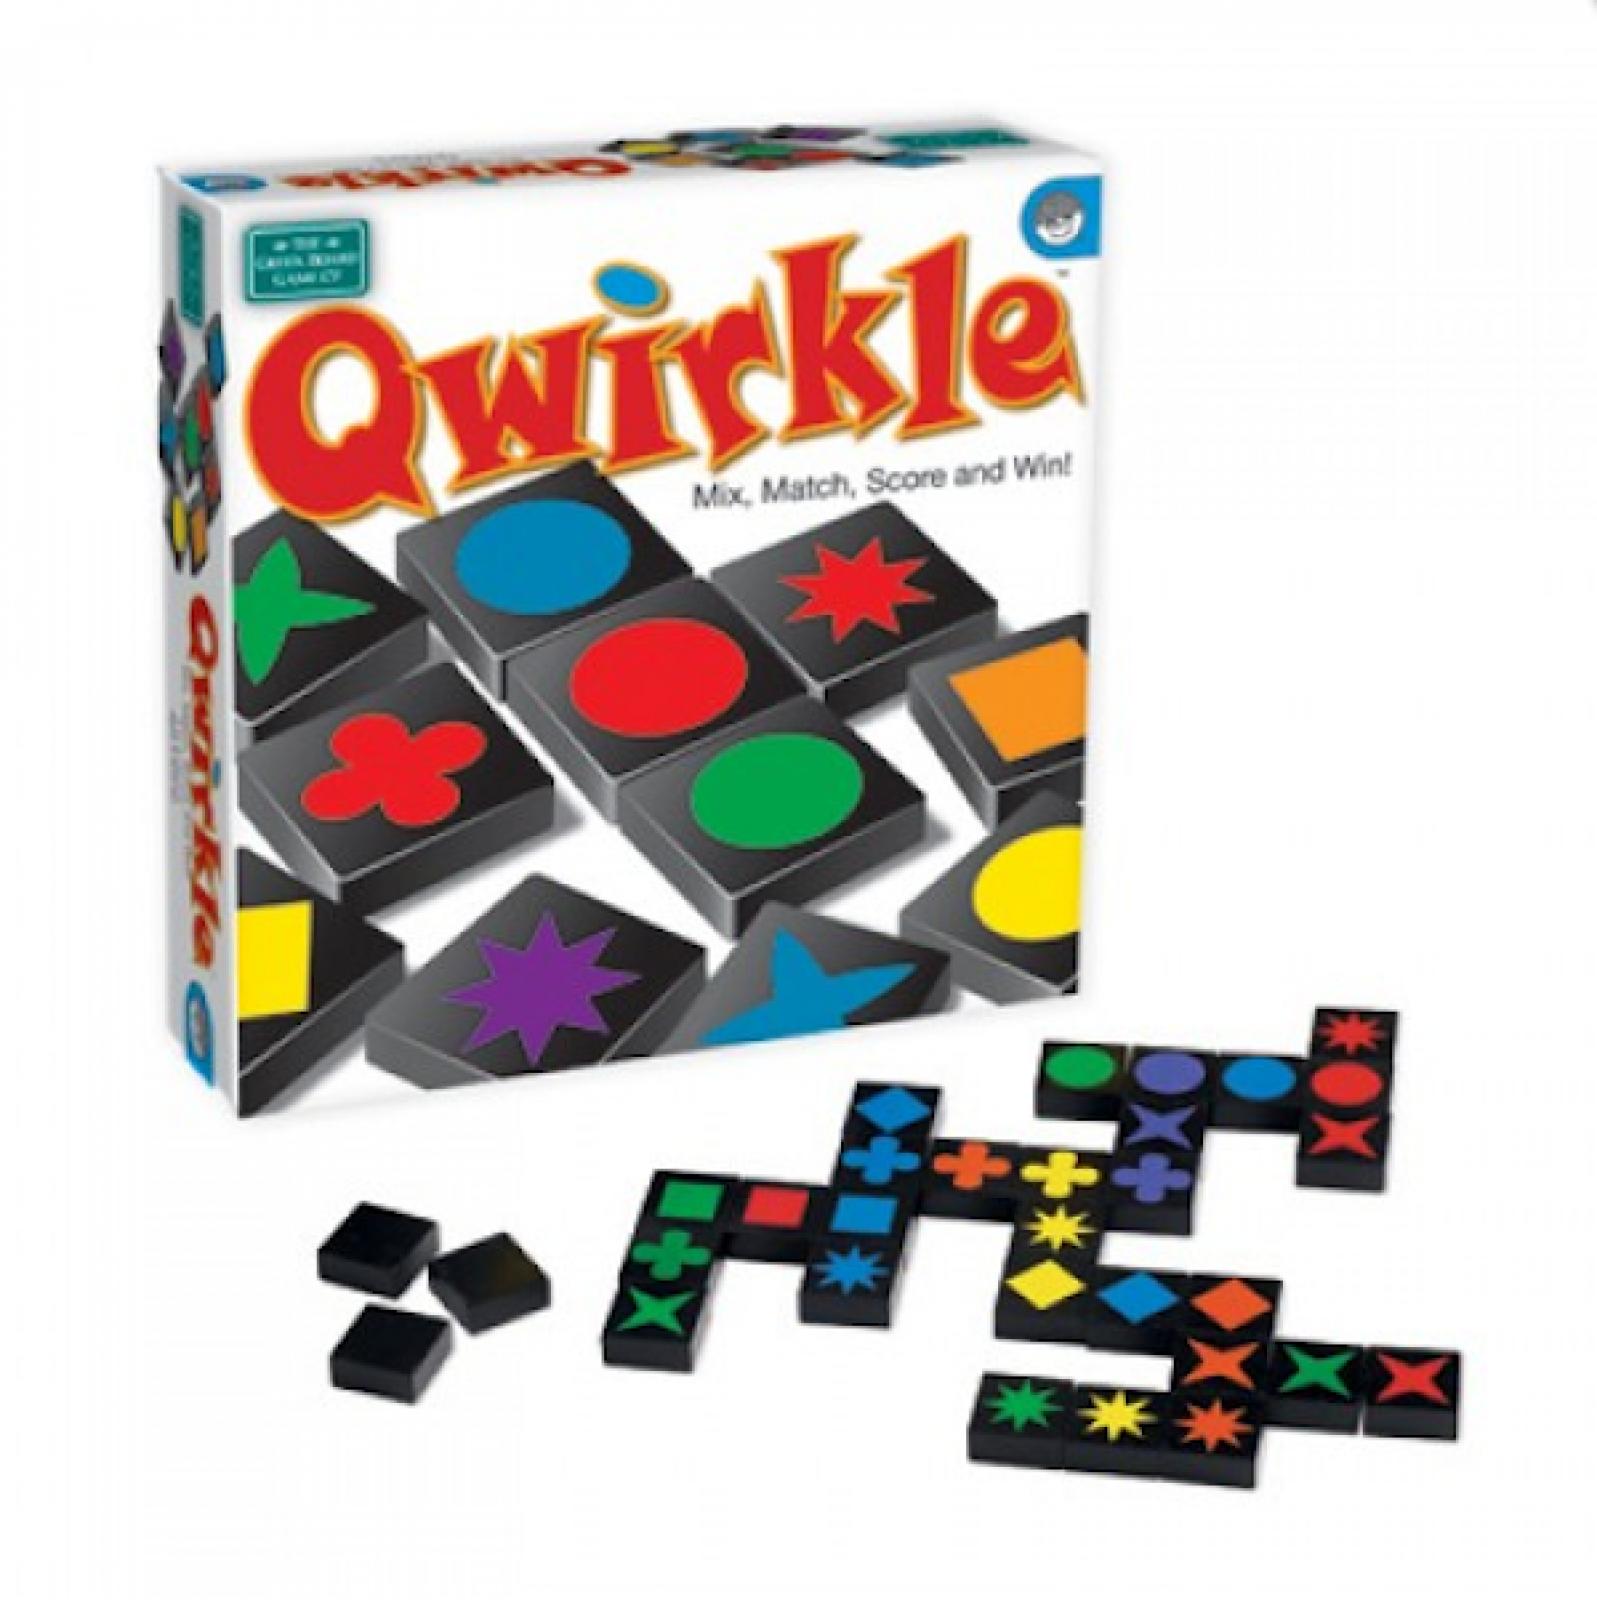 Qwirkle Game Mix And Match Colour Shape Game 6+ thumbnails